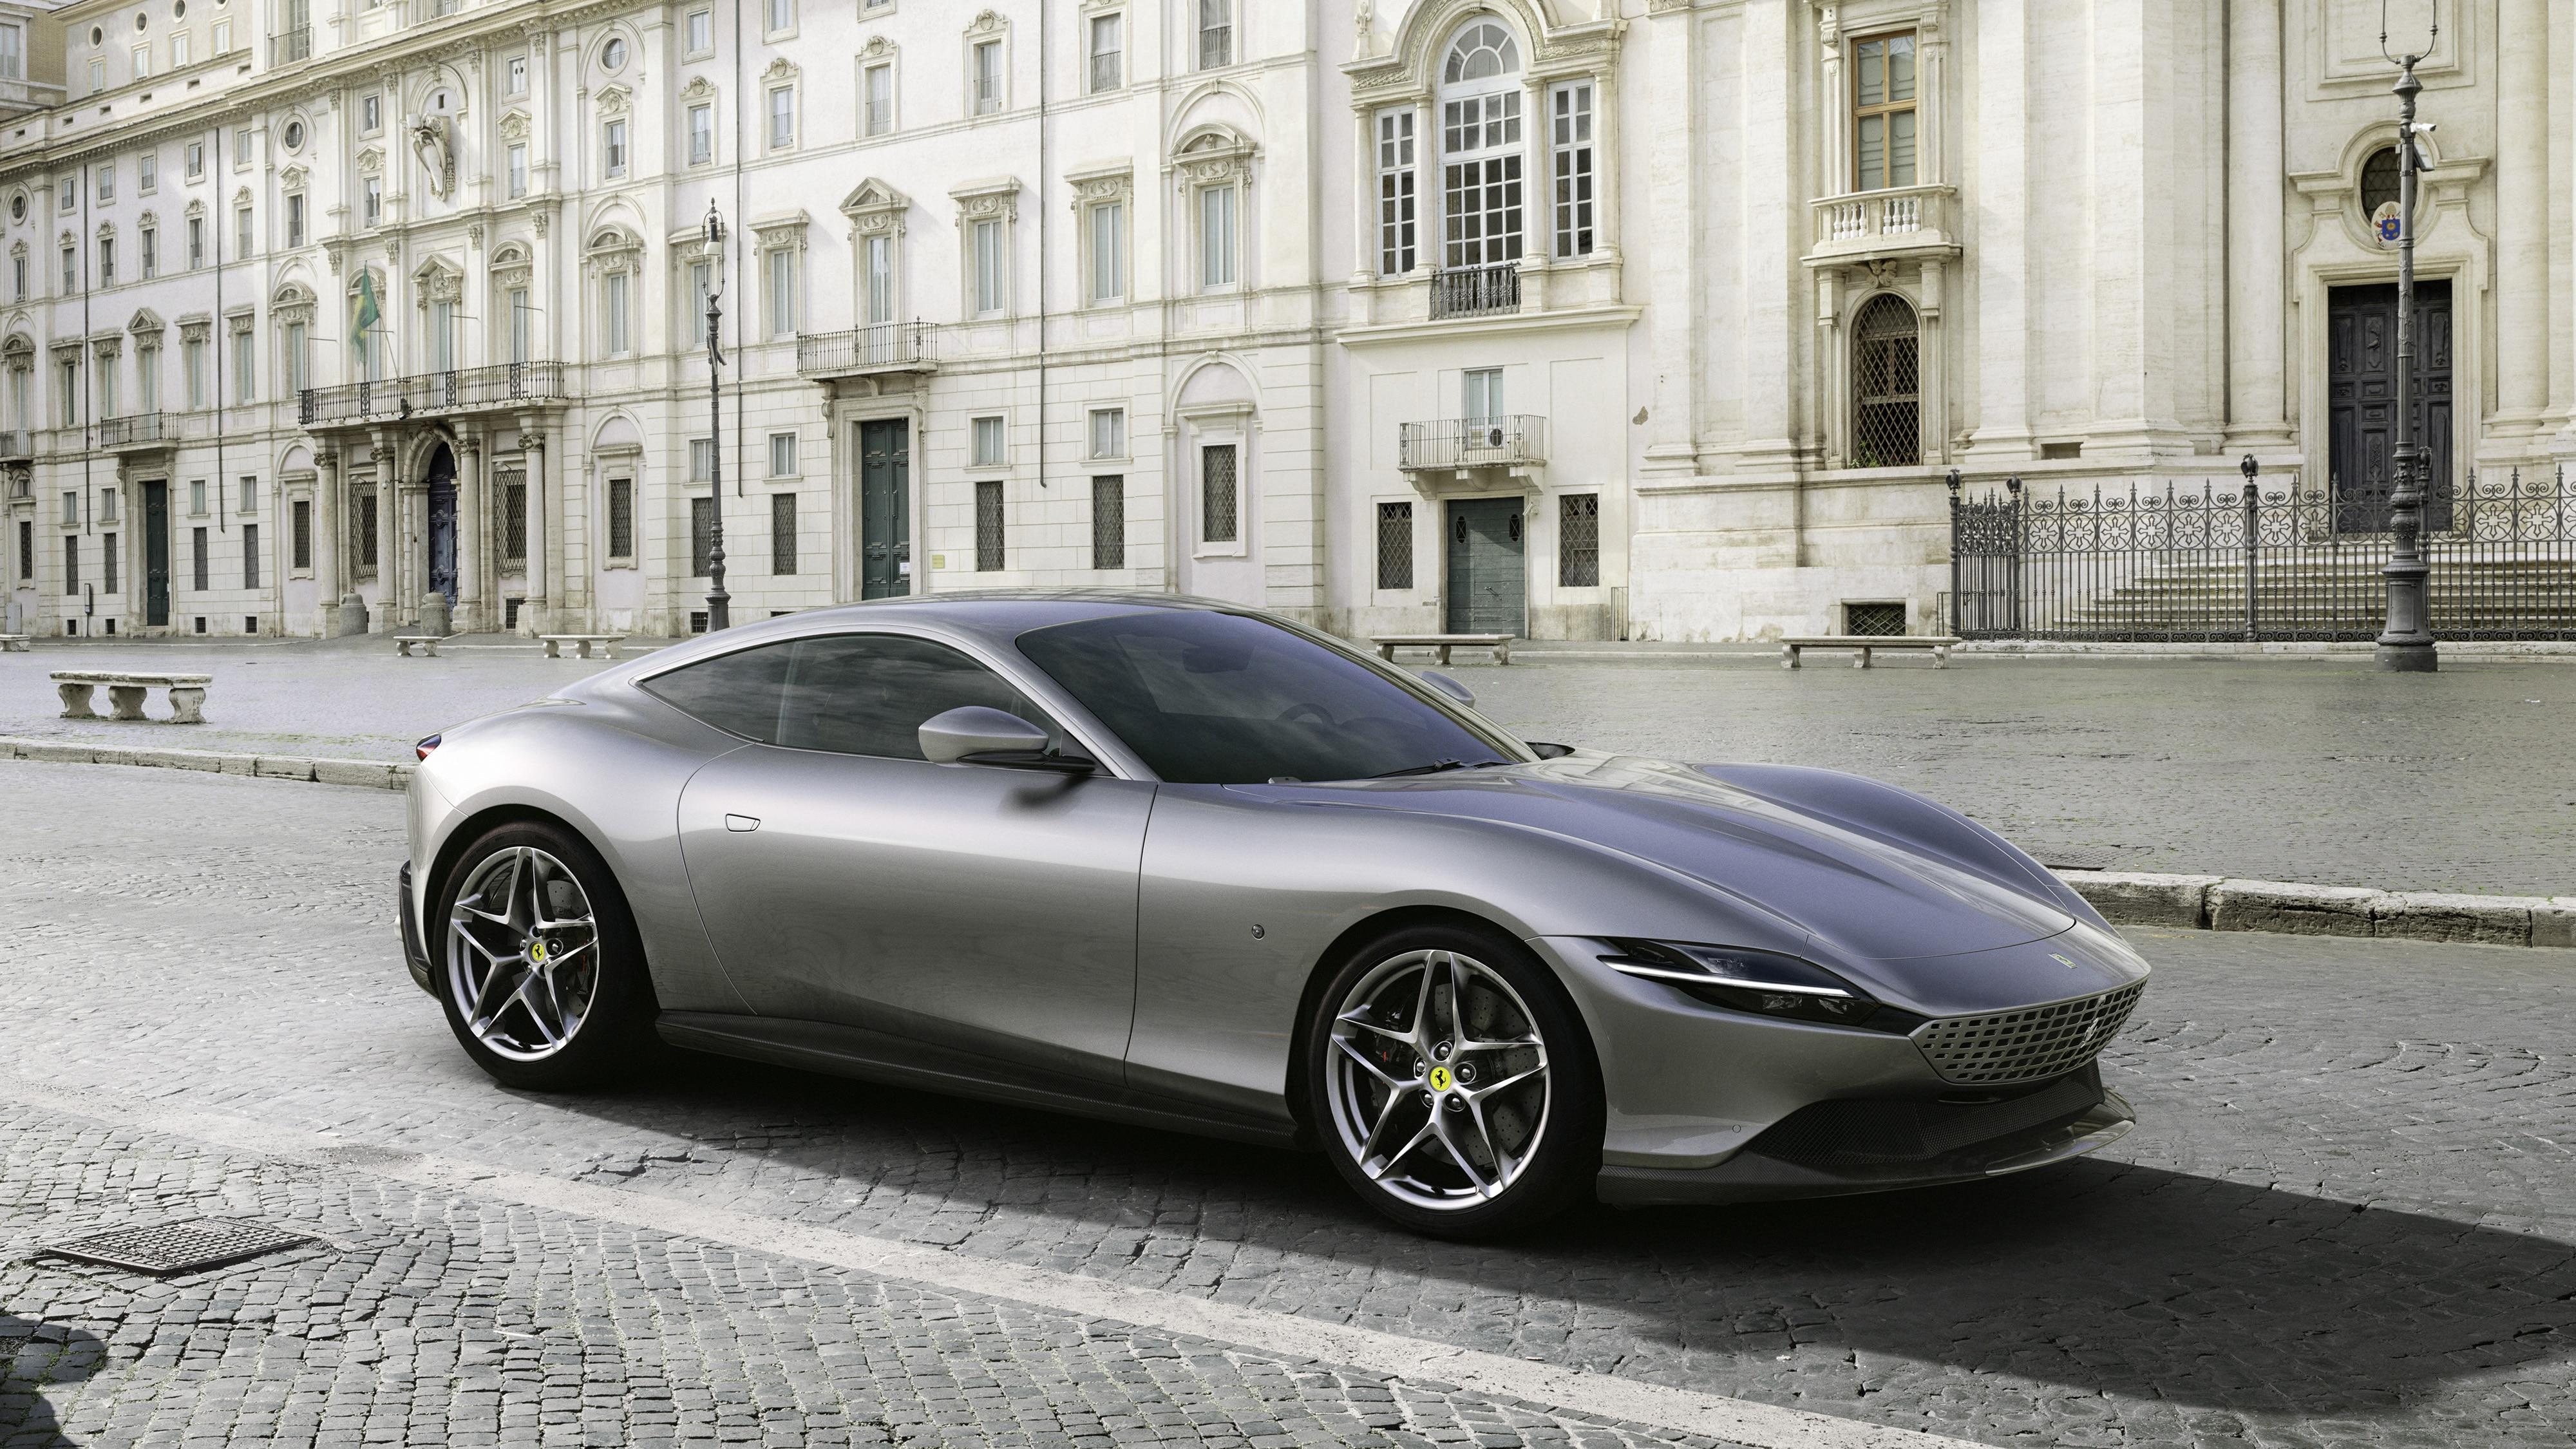 2020 Ferrari Roma The Latest Front Engine Gt From Maranello